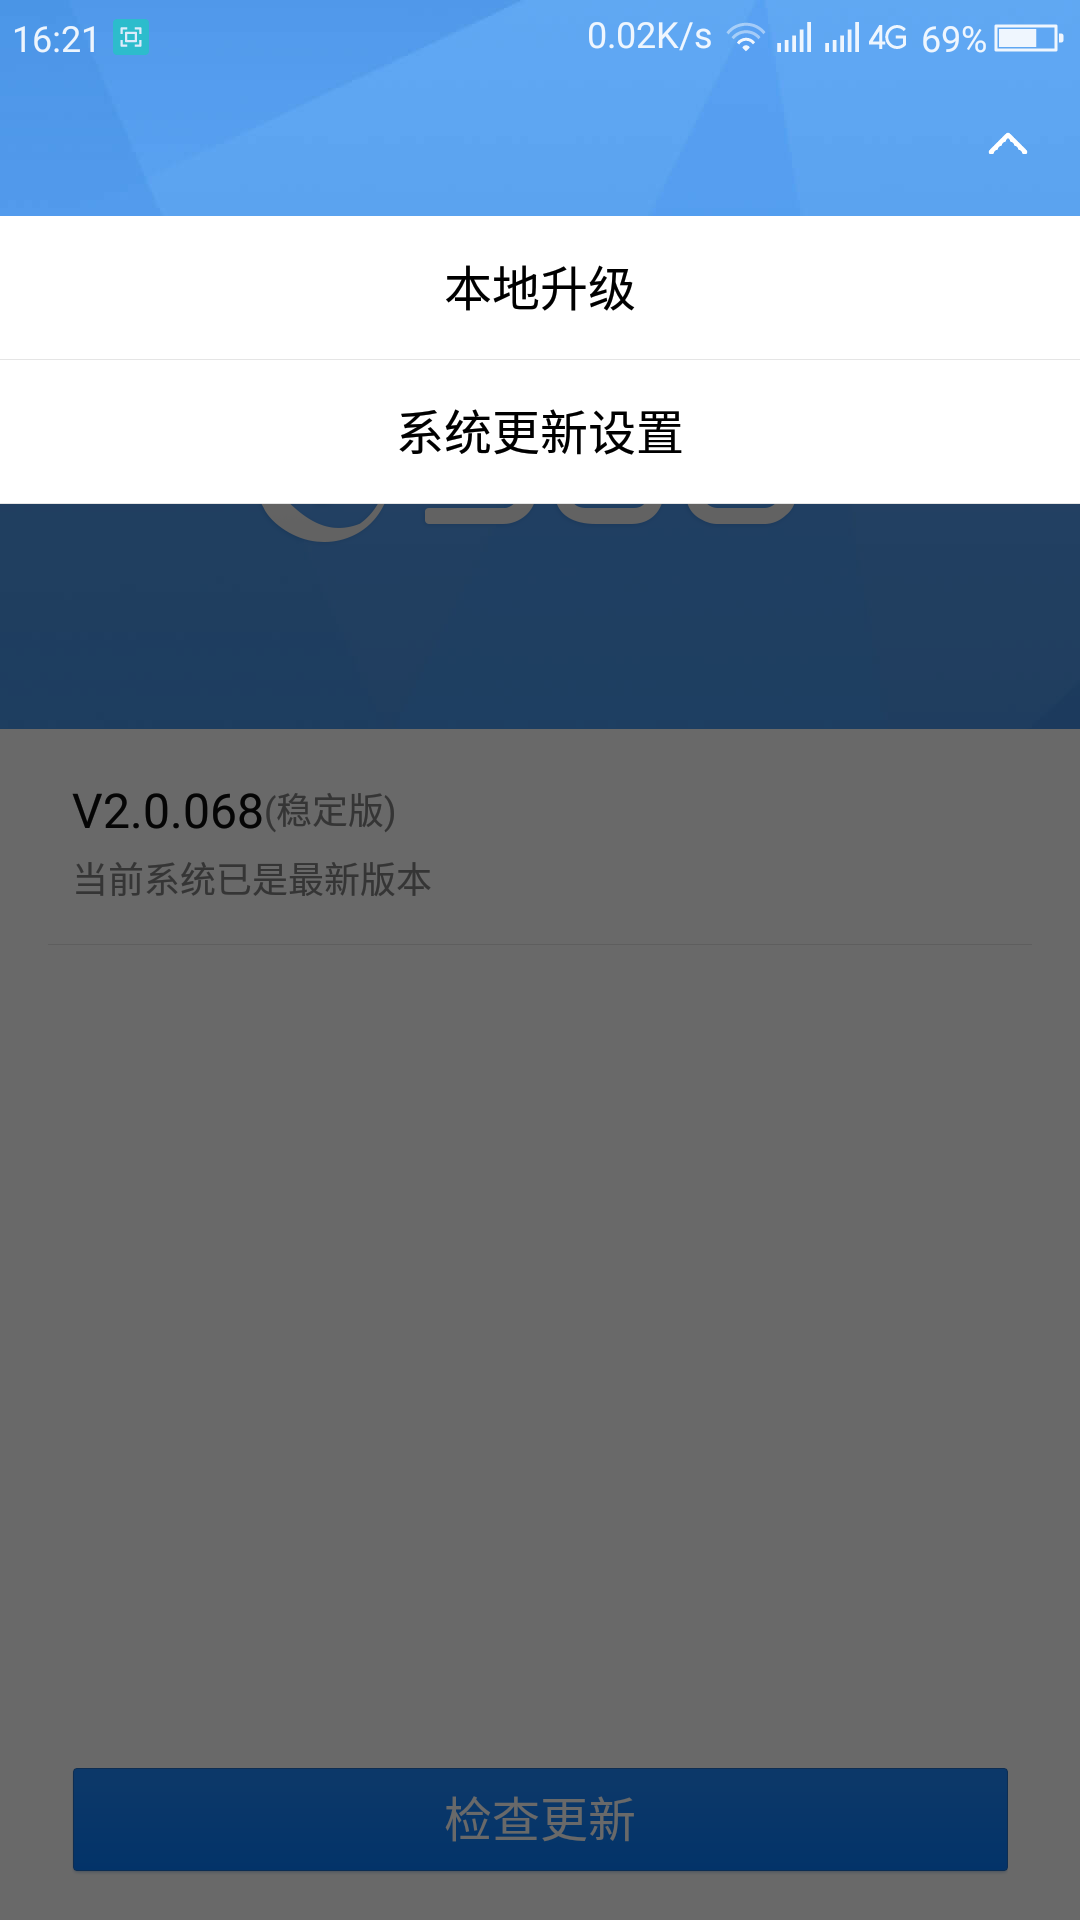 Screenshot_2016-09-21-16-21-25.png